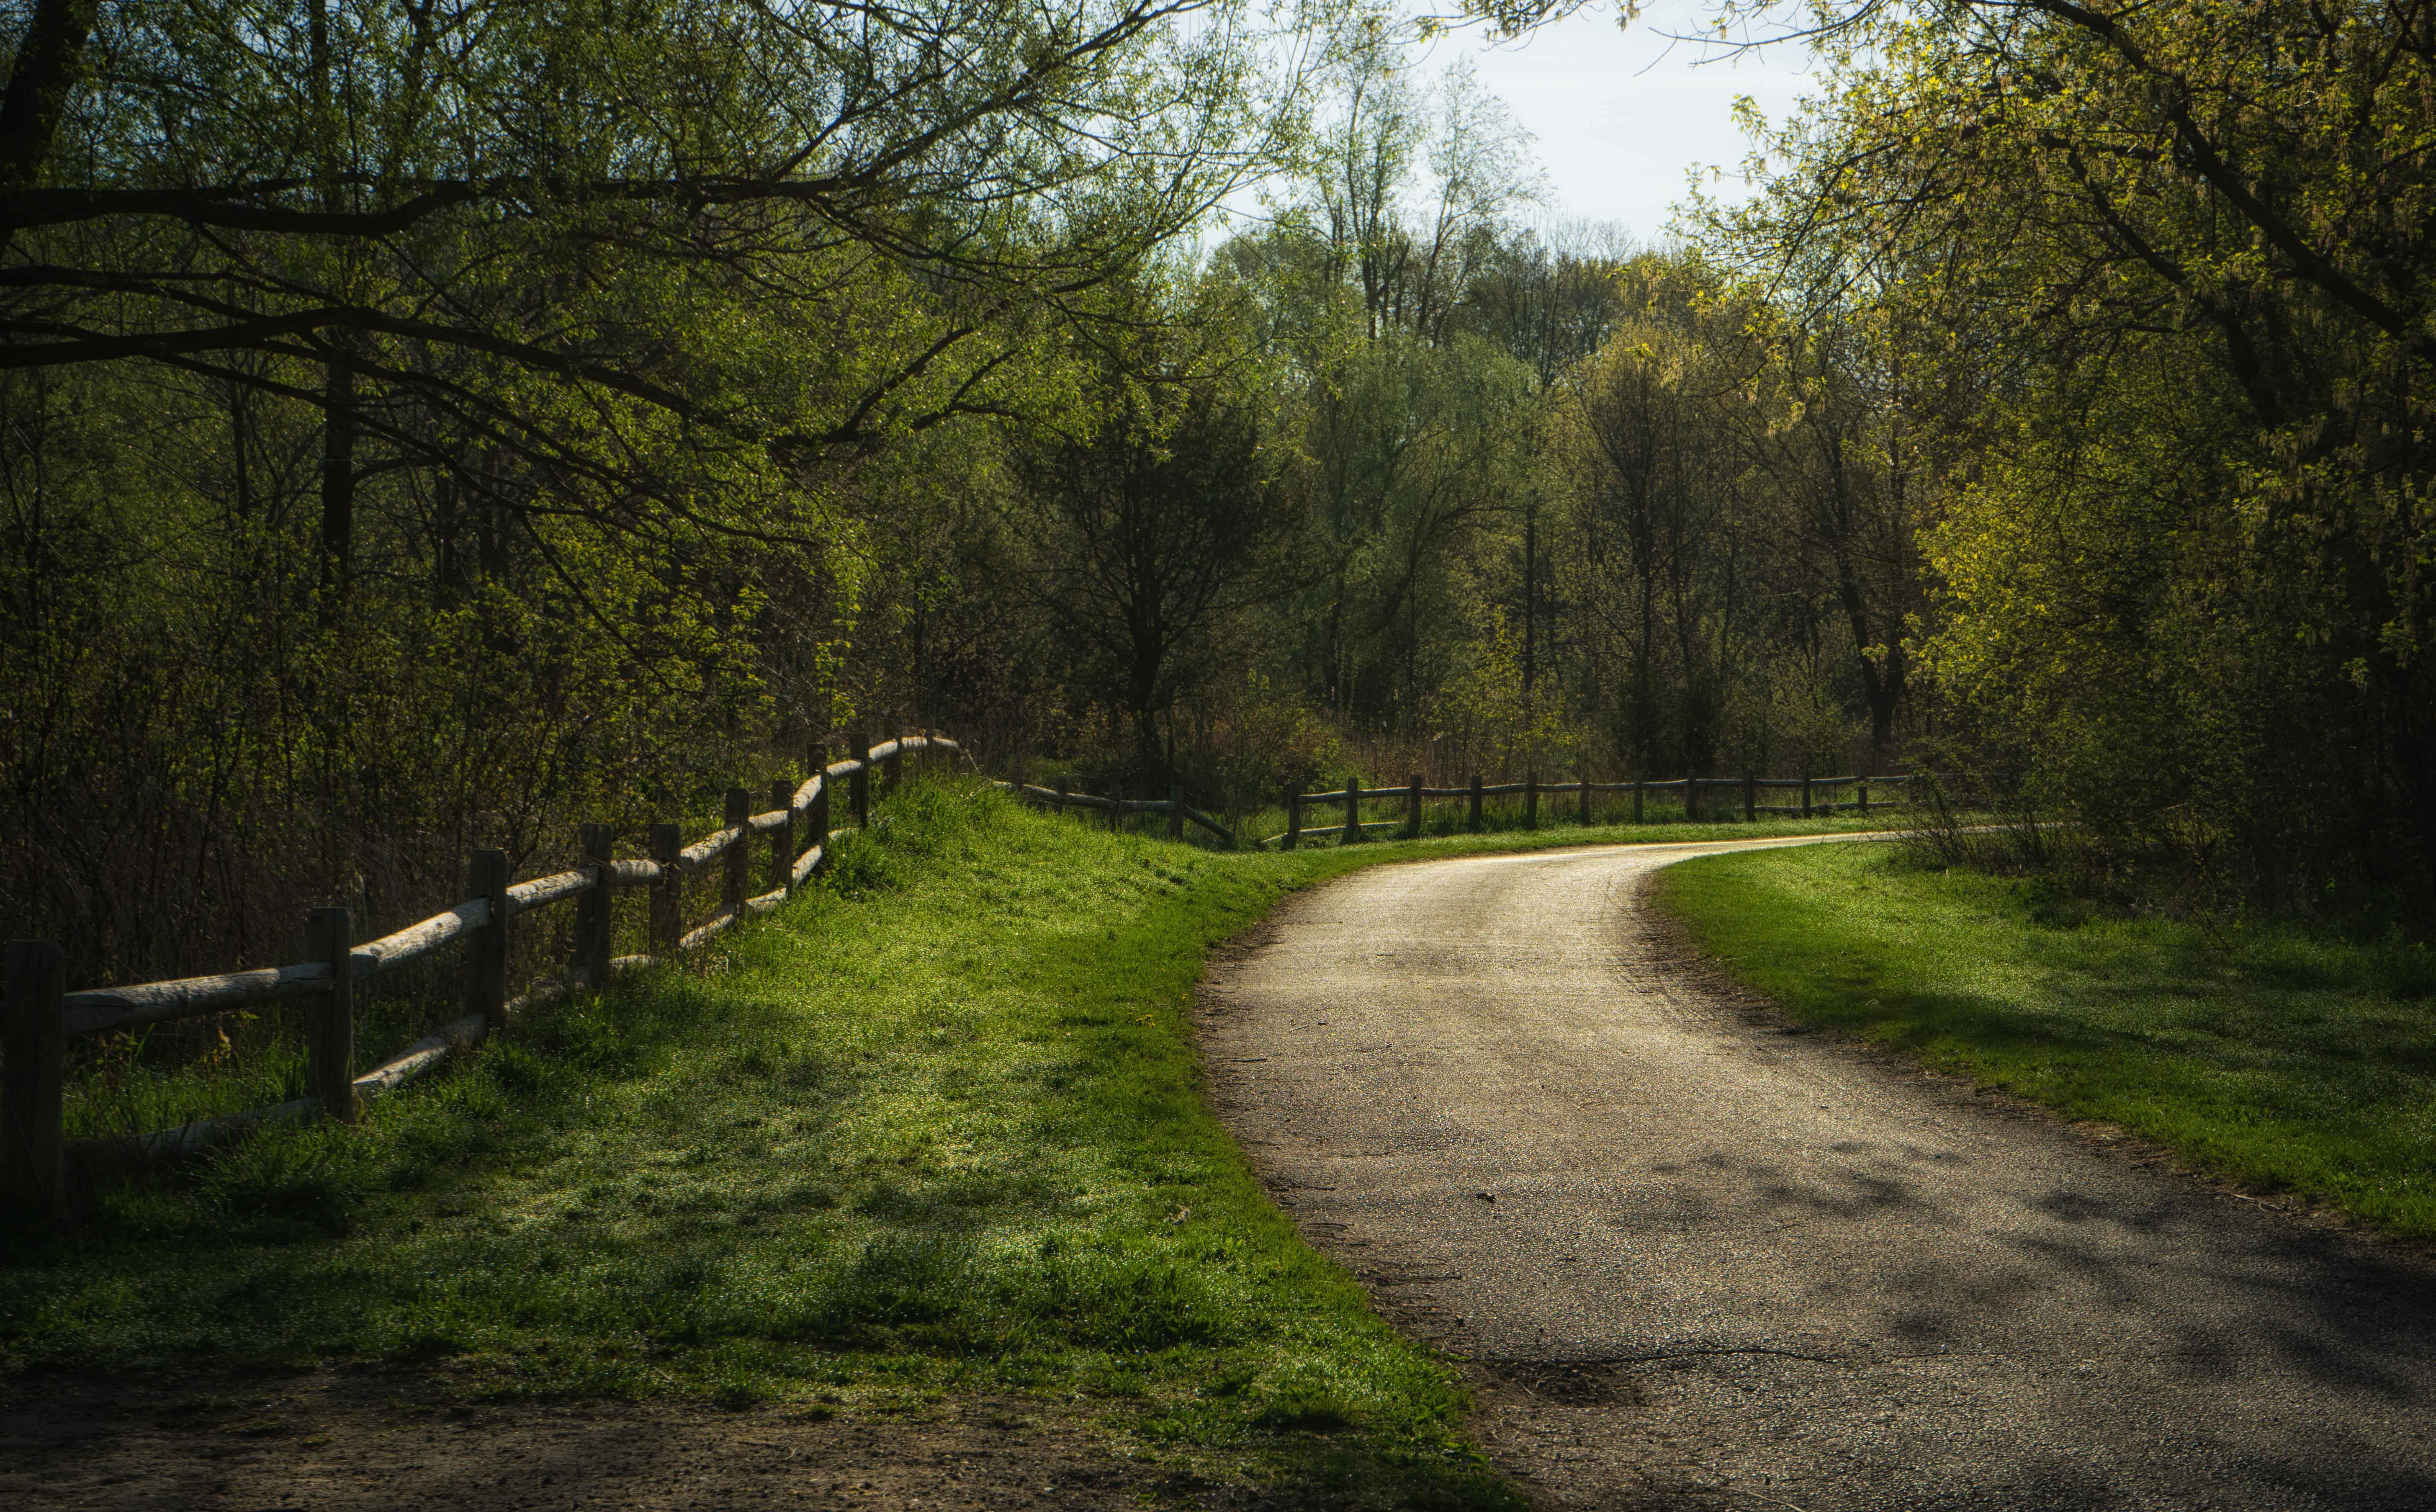 pathway turns